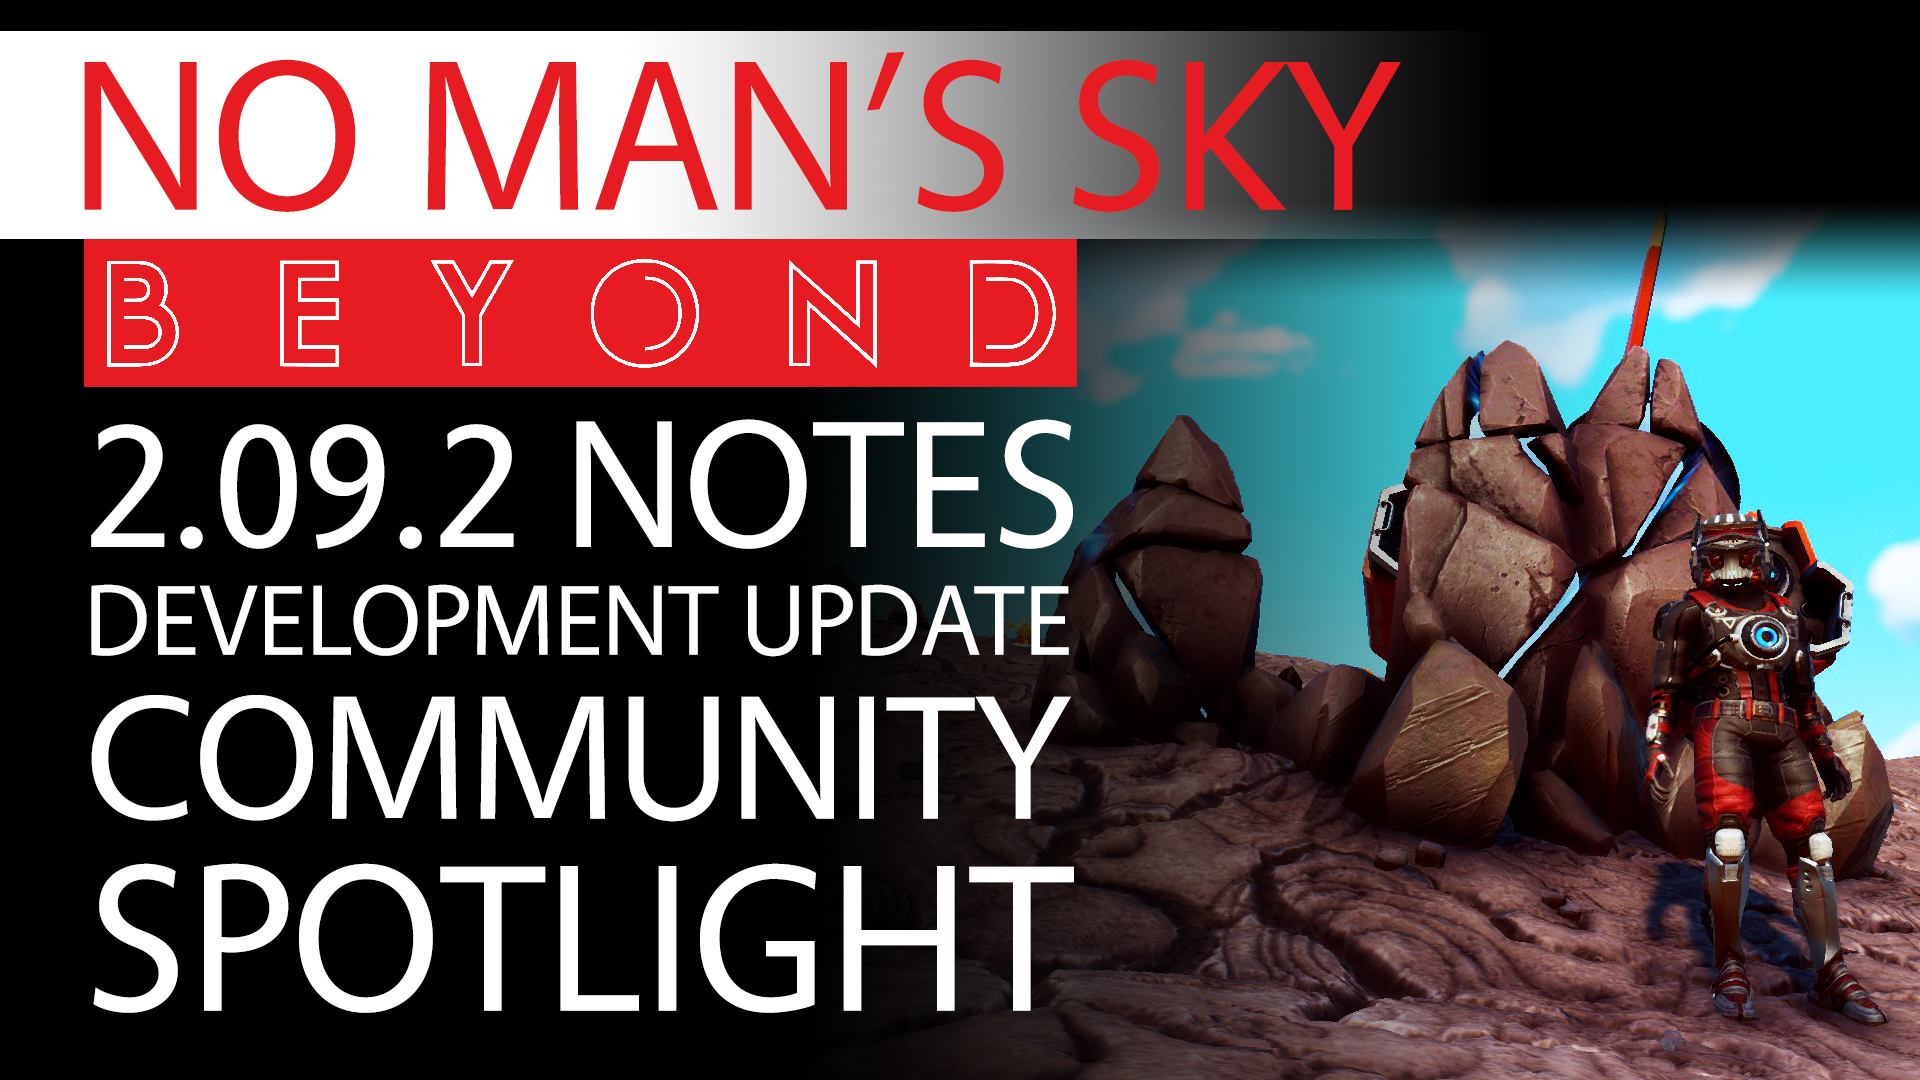 No Man's Sky Beyond News - Patch 2.09.2 Notes & Development Update With Community Spotlight Thumbnail